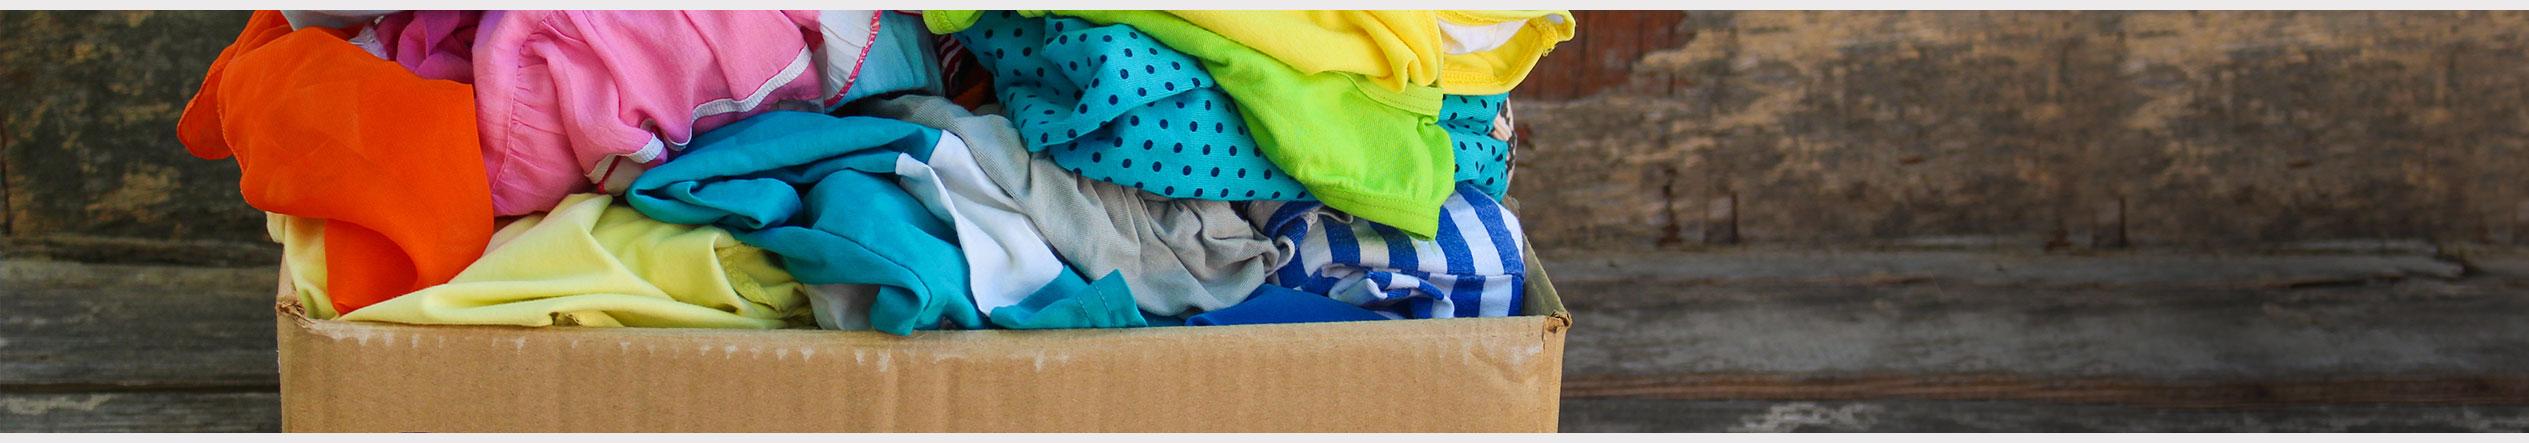 Cradles to Crayons partnership at Jordan's Furniture stores in CT, MA, NH, and RI